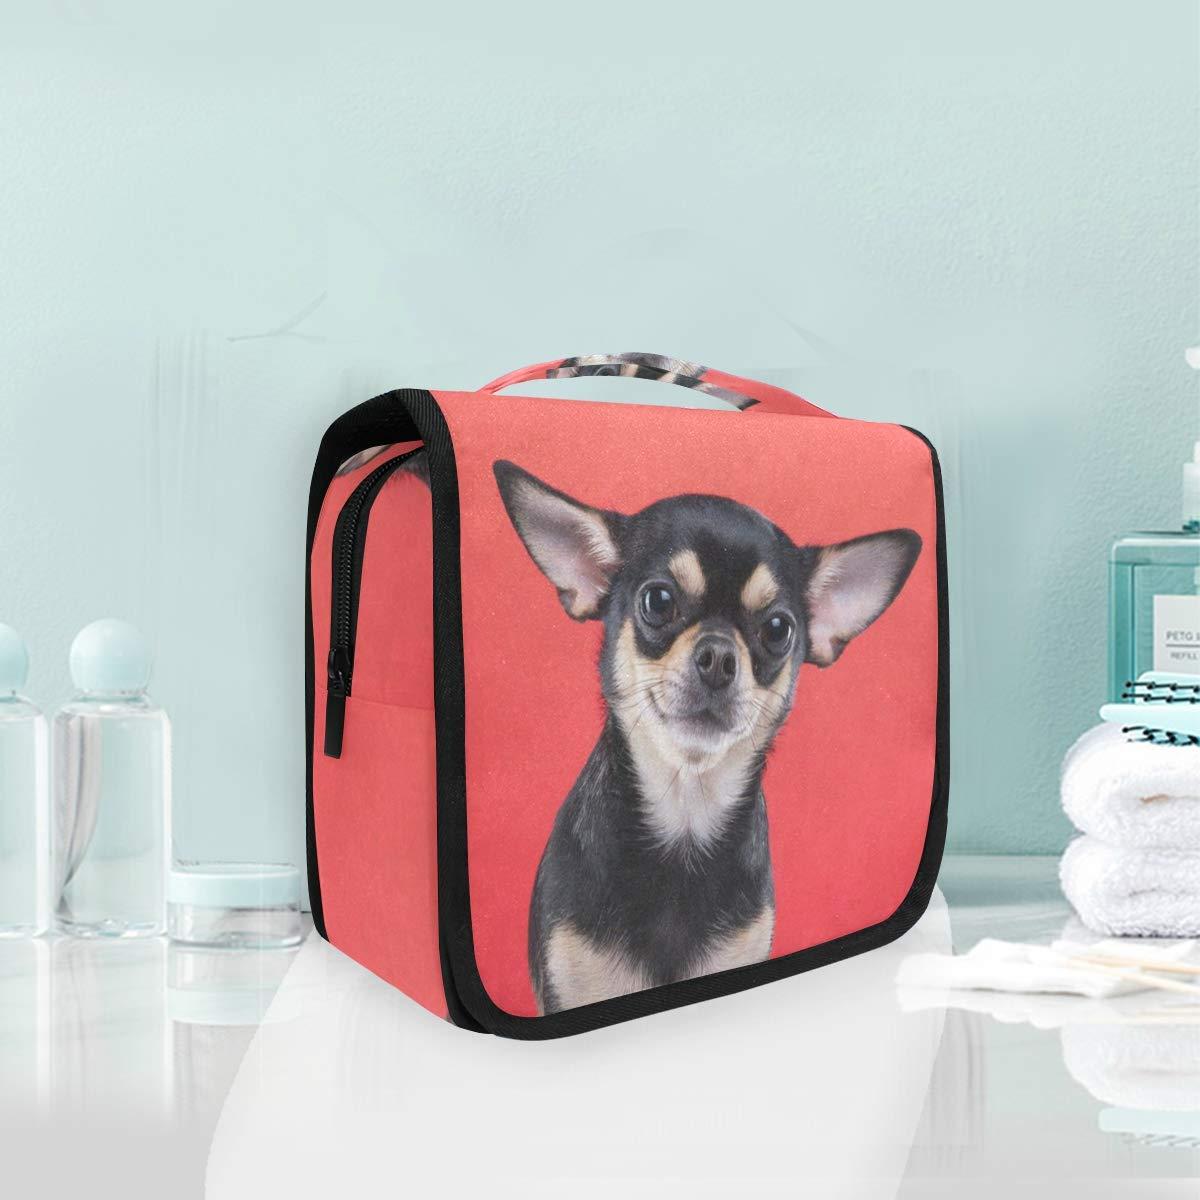 Cute Zip Up Dog Purse Chihuahua